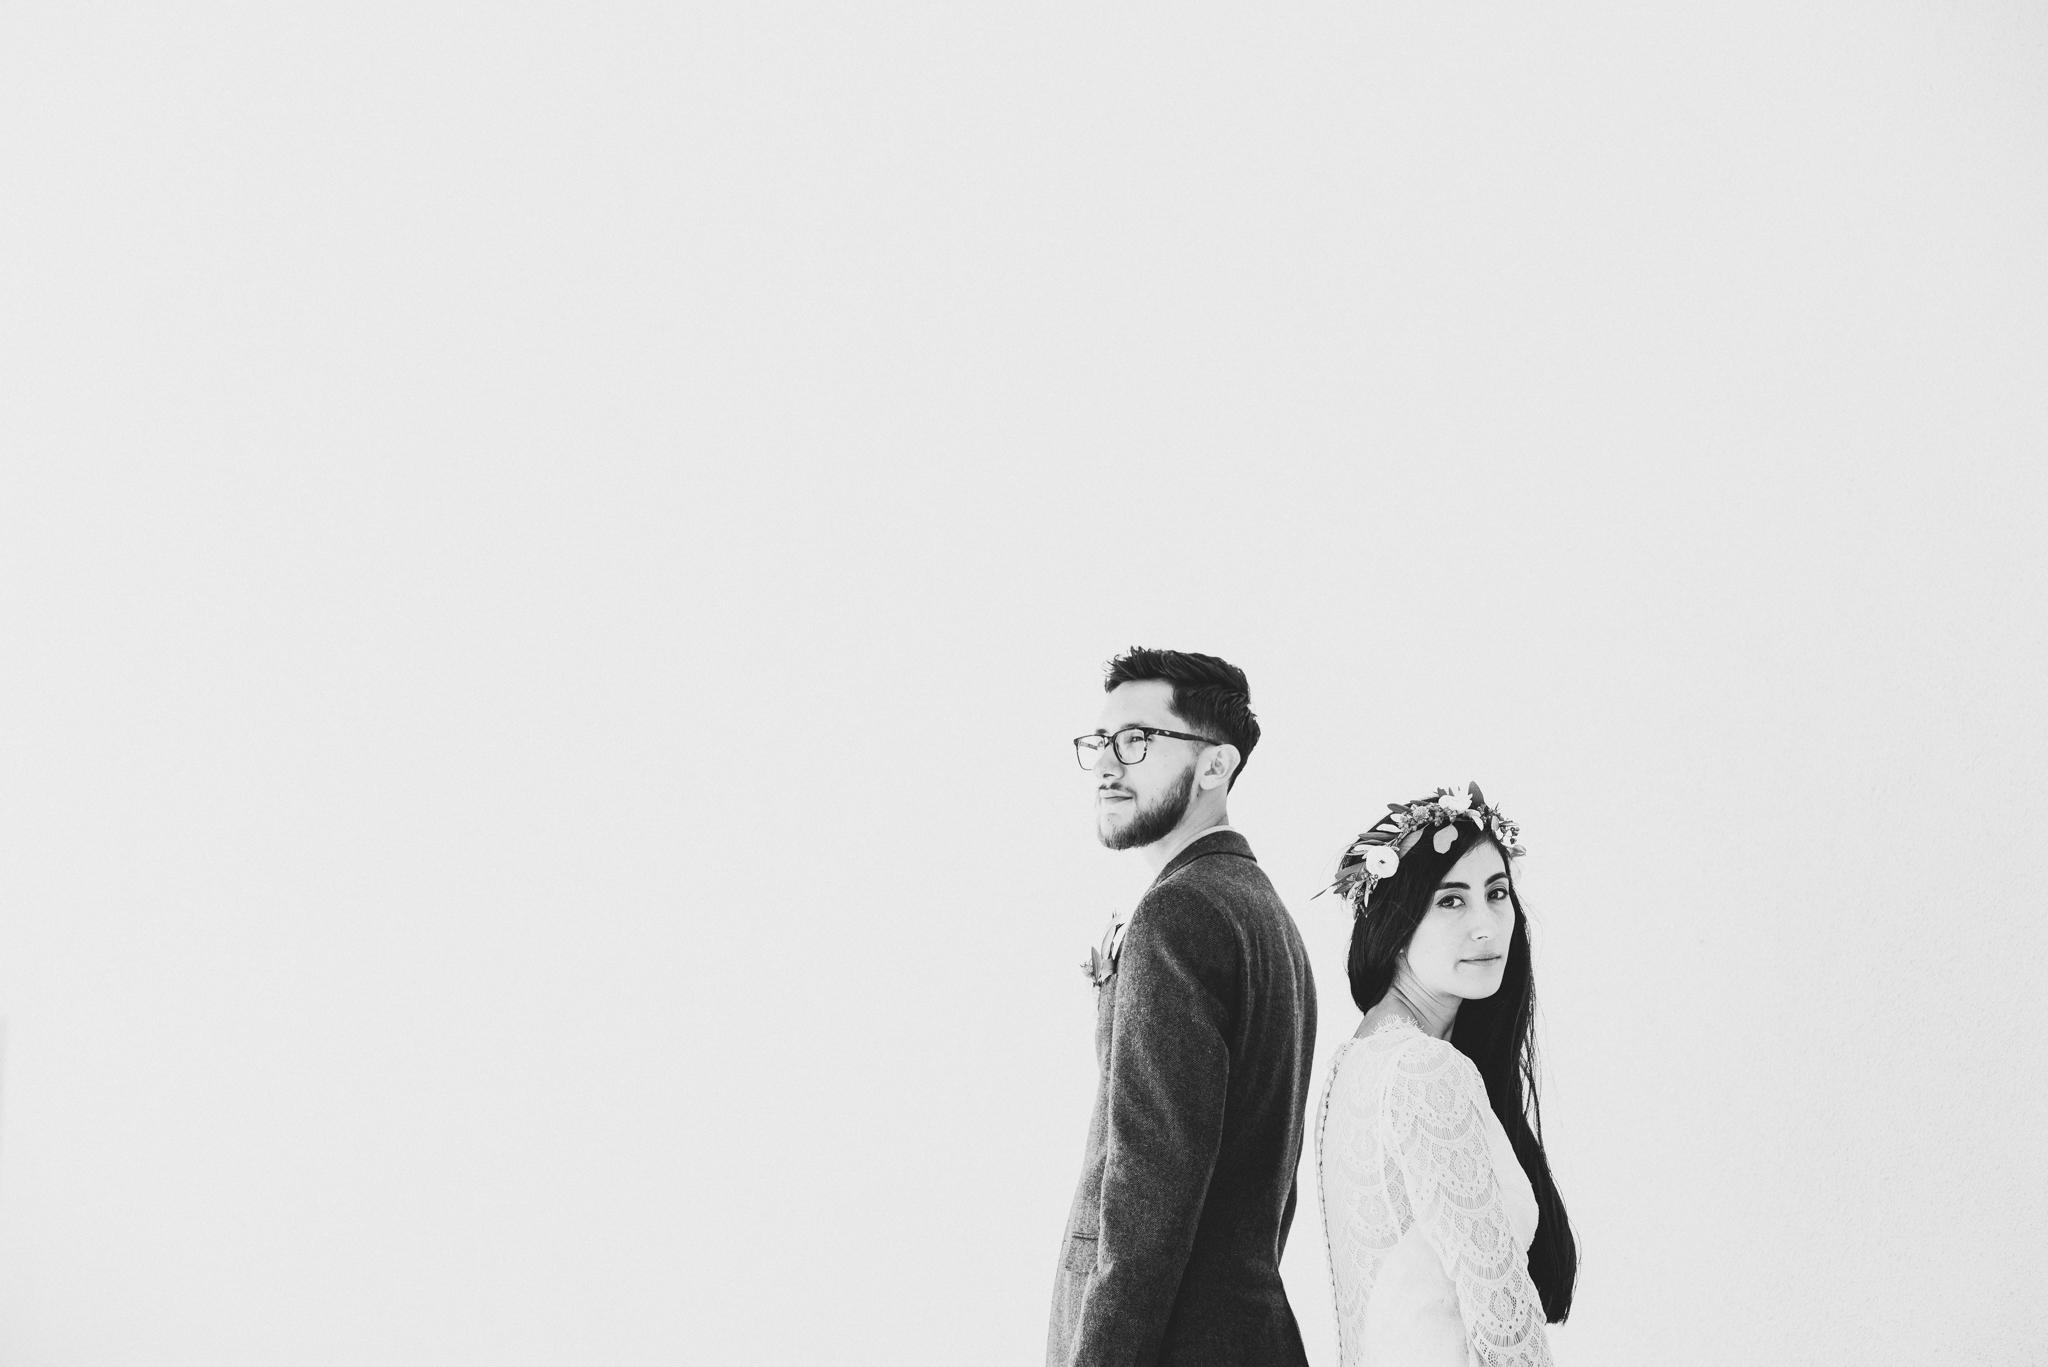 ©Isaiah-&-Taylor-Photography---Oak-Canyon-Nature-Center-Wedding,-Anaheim-Hills-085.jpg